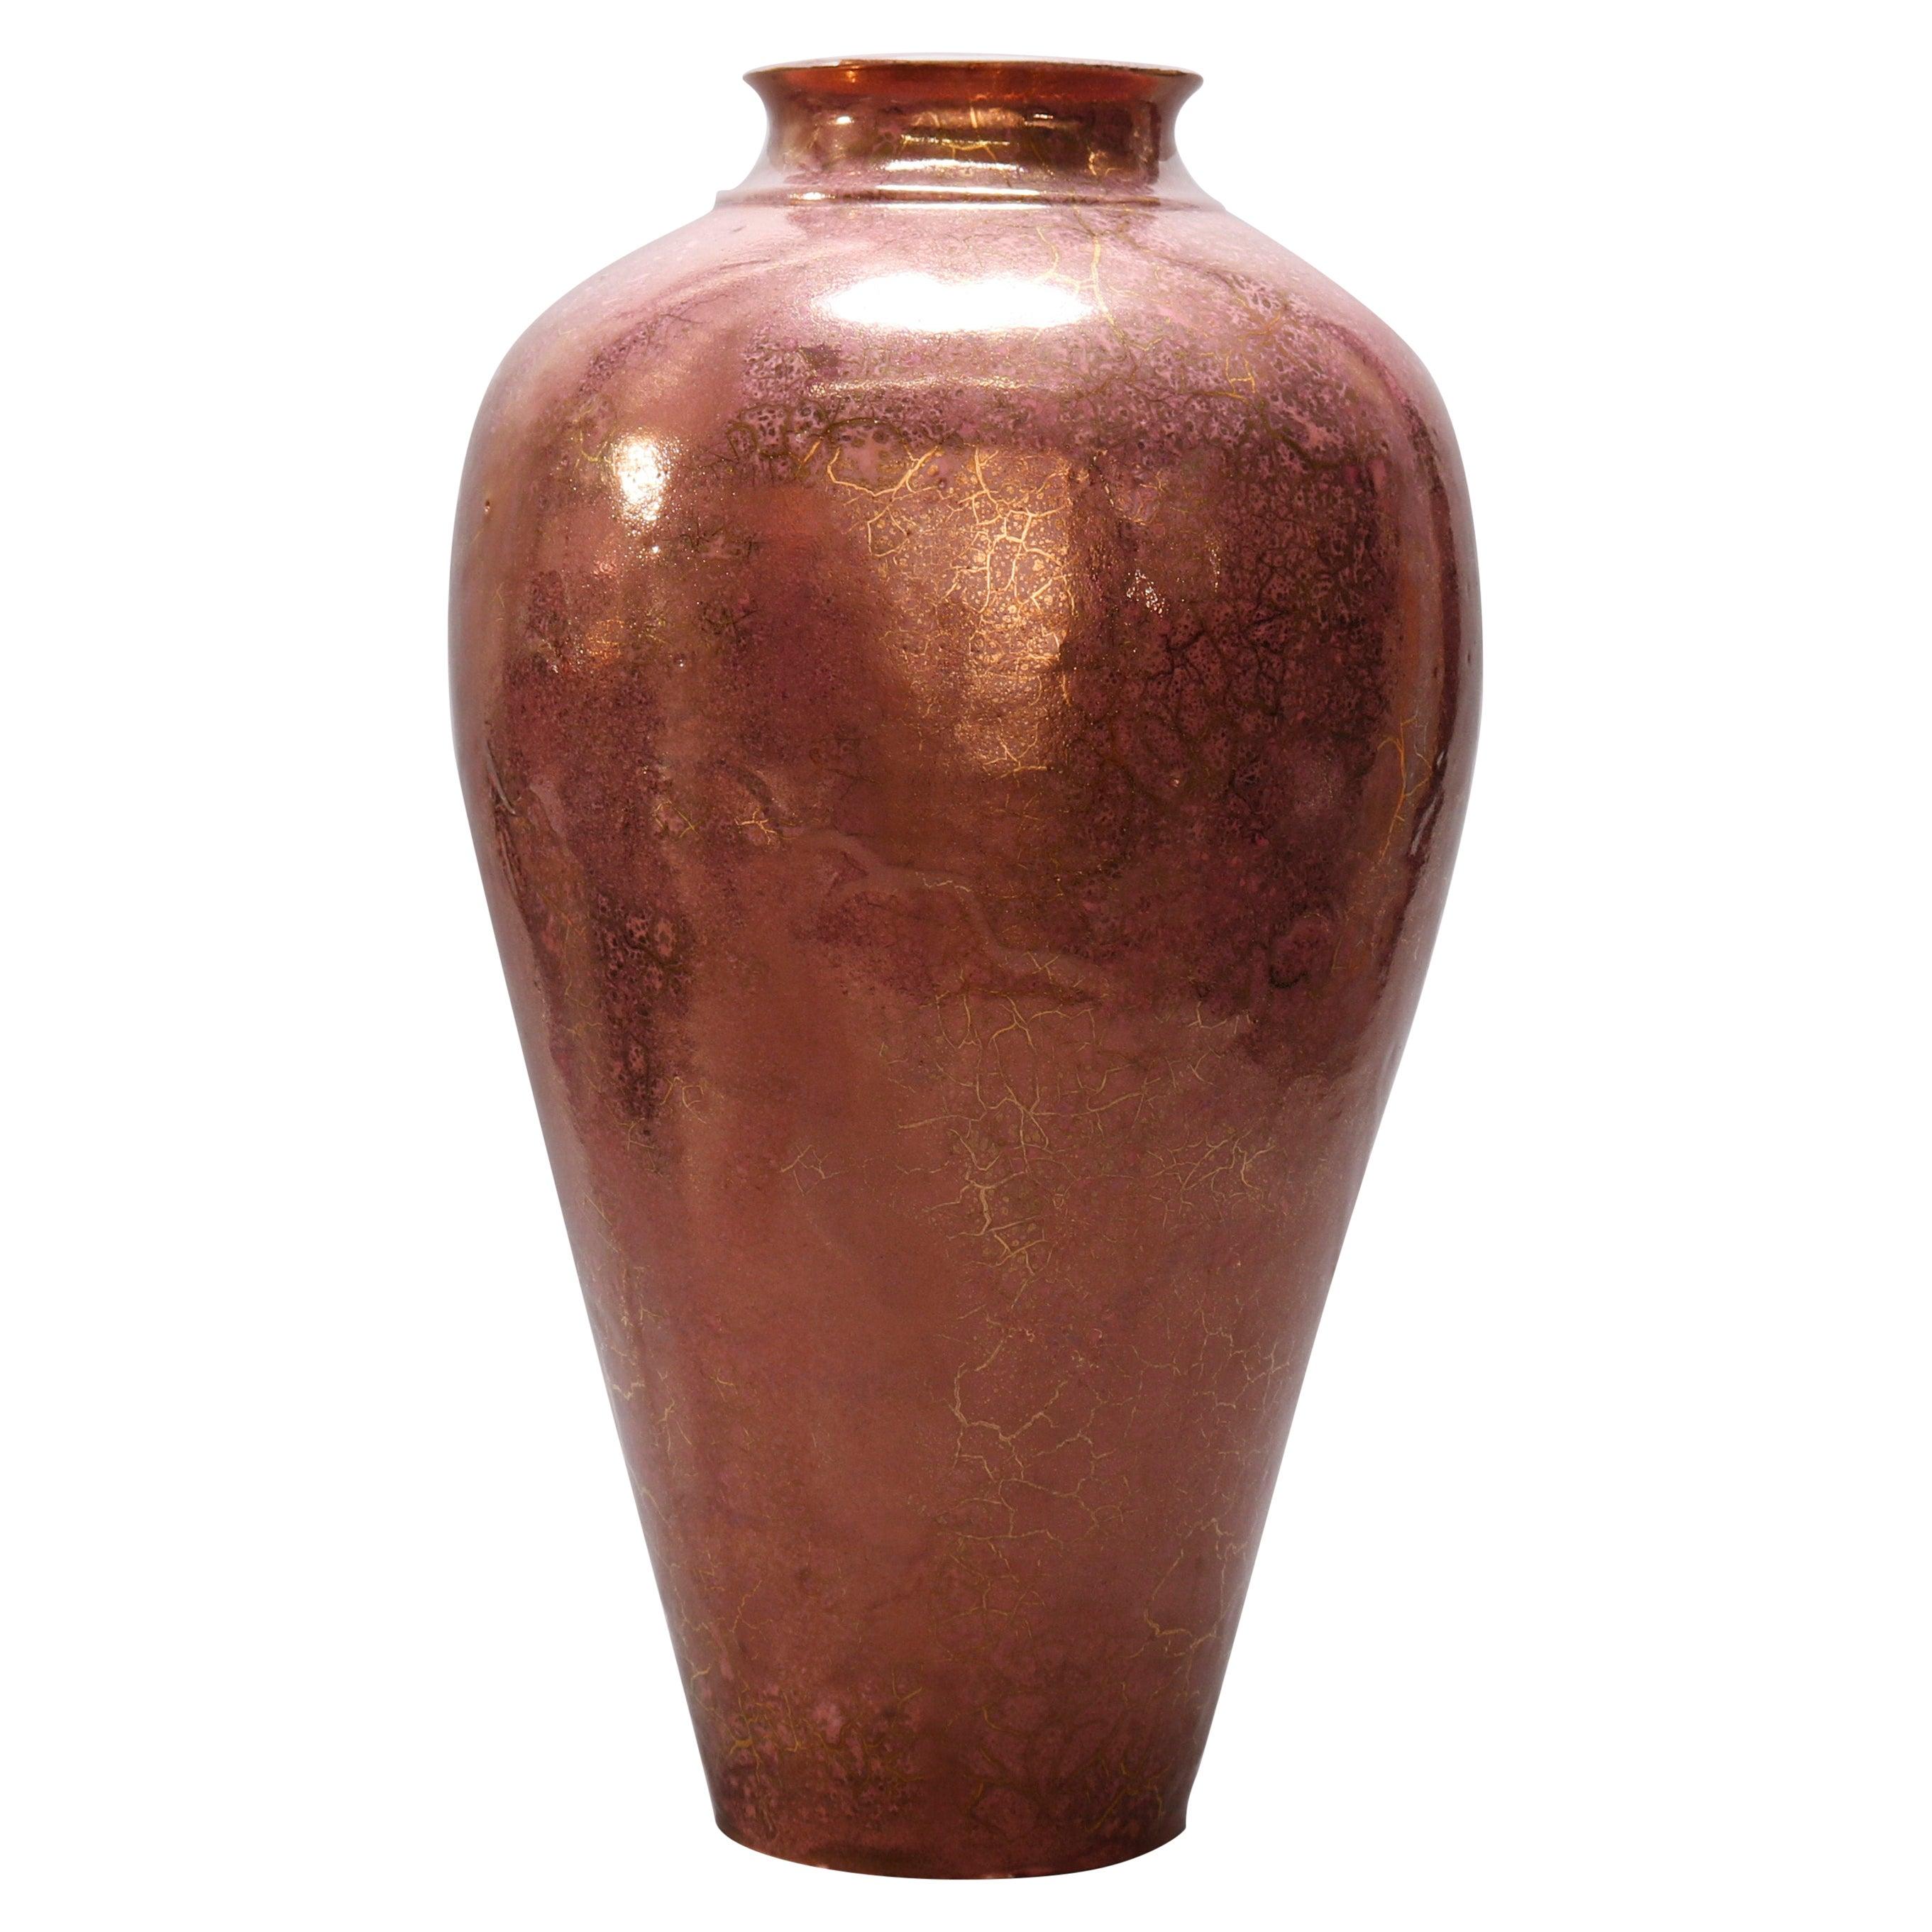 Vintage Rose Luster Hand Thrown Art Pottery Floor Vase, circa 1960